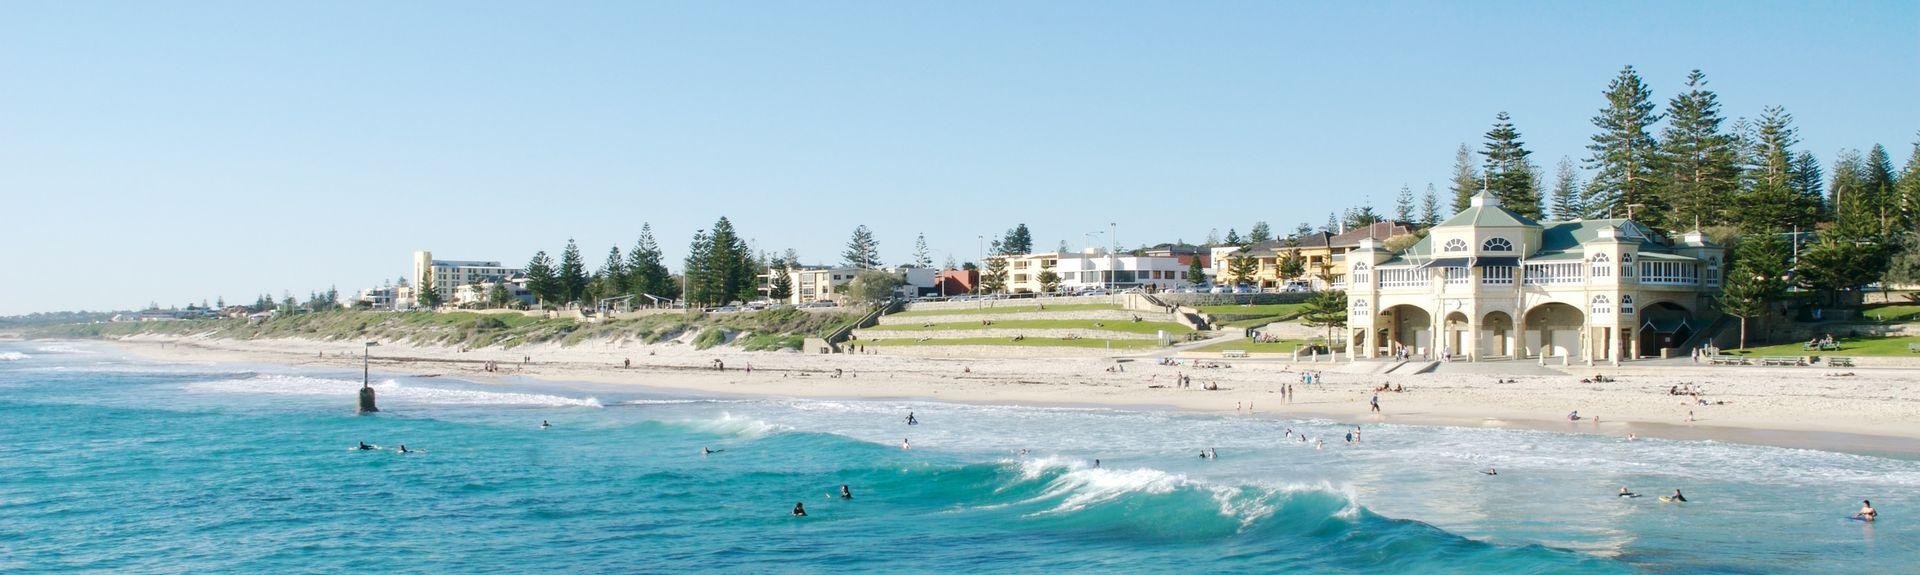 Cottesloe, Perth, Western Australia, Australia